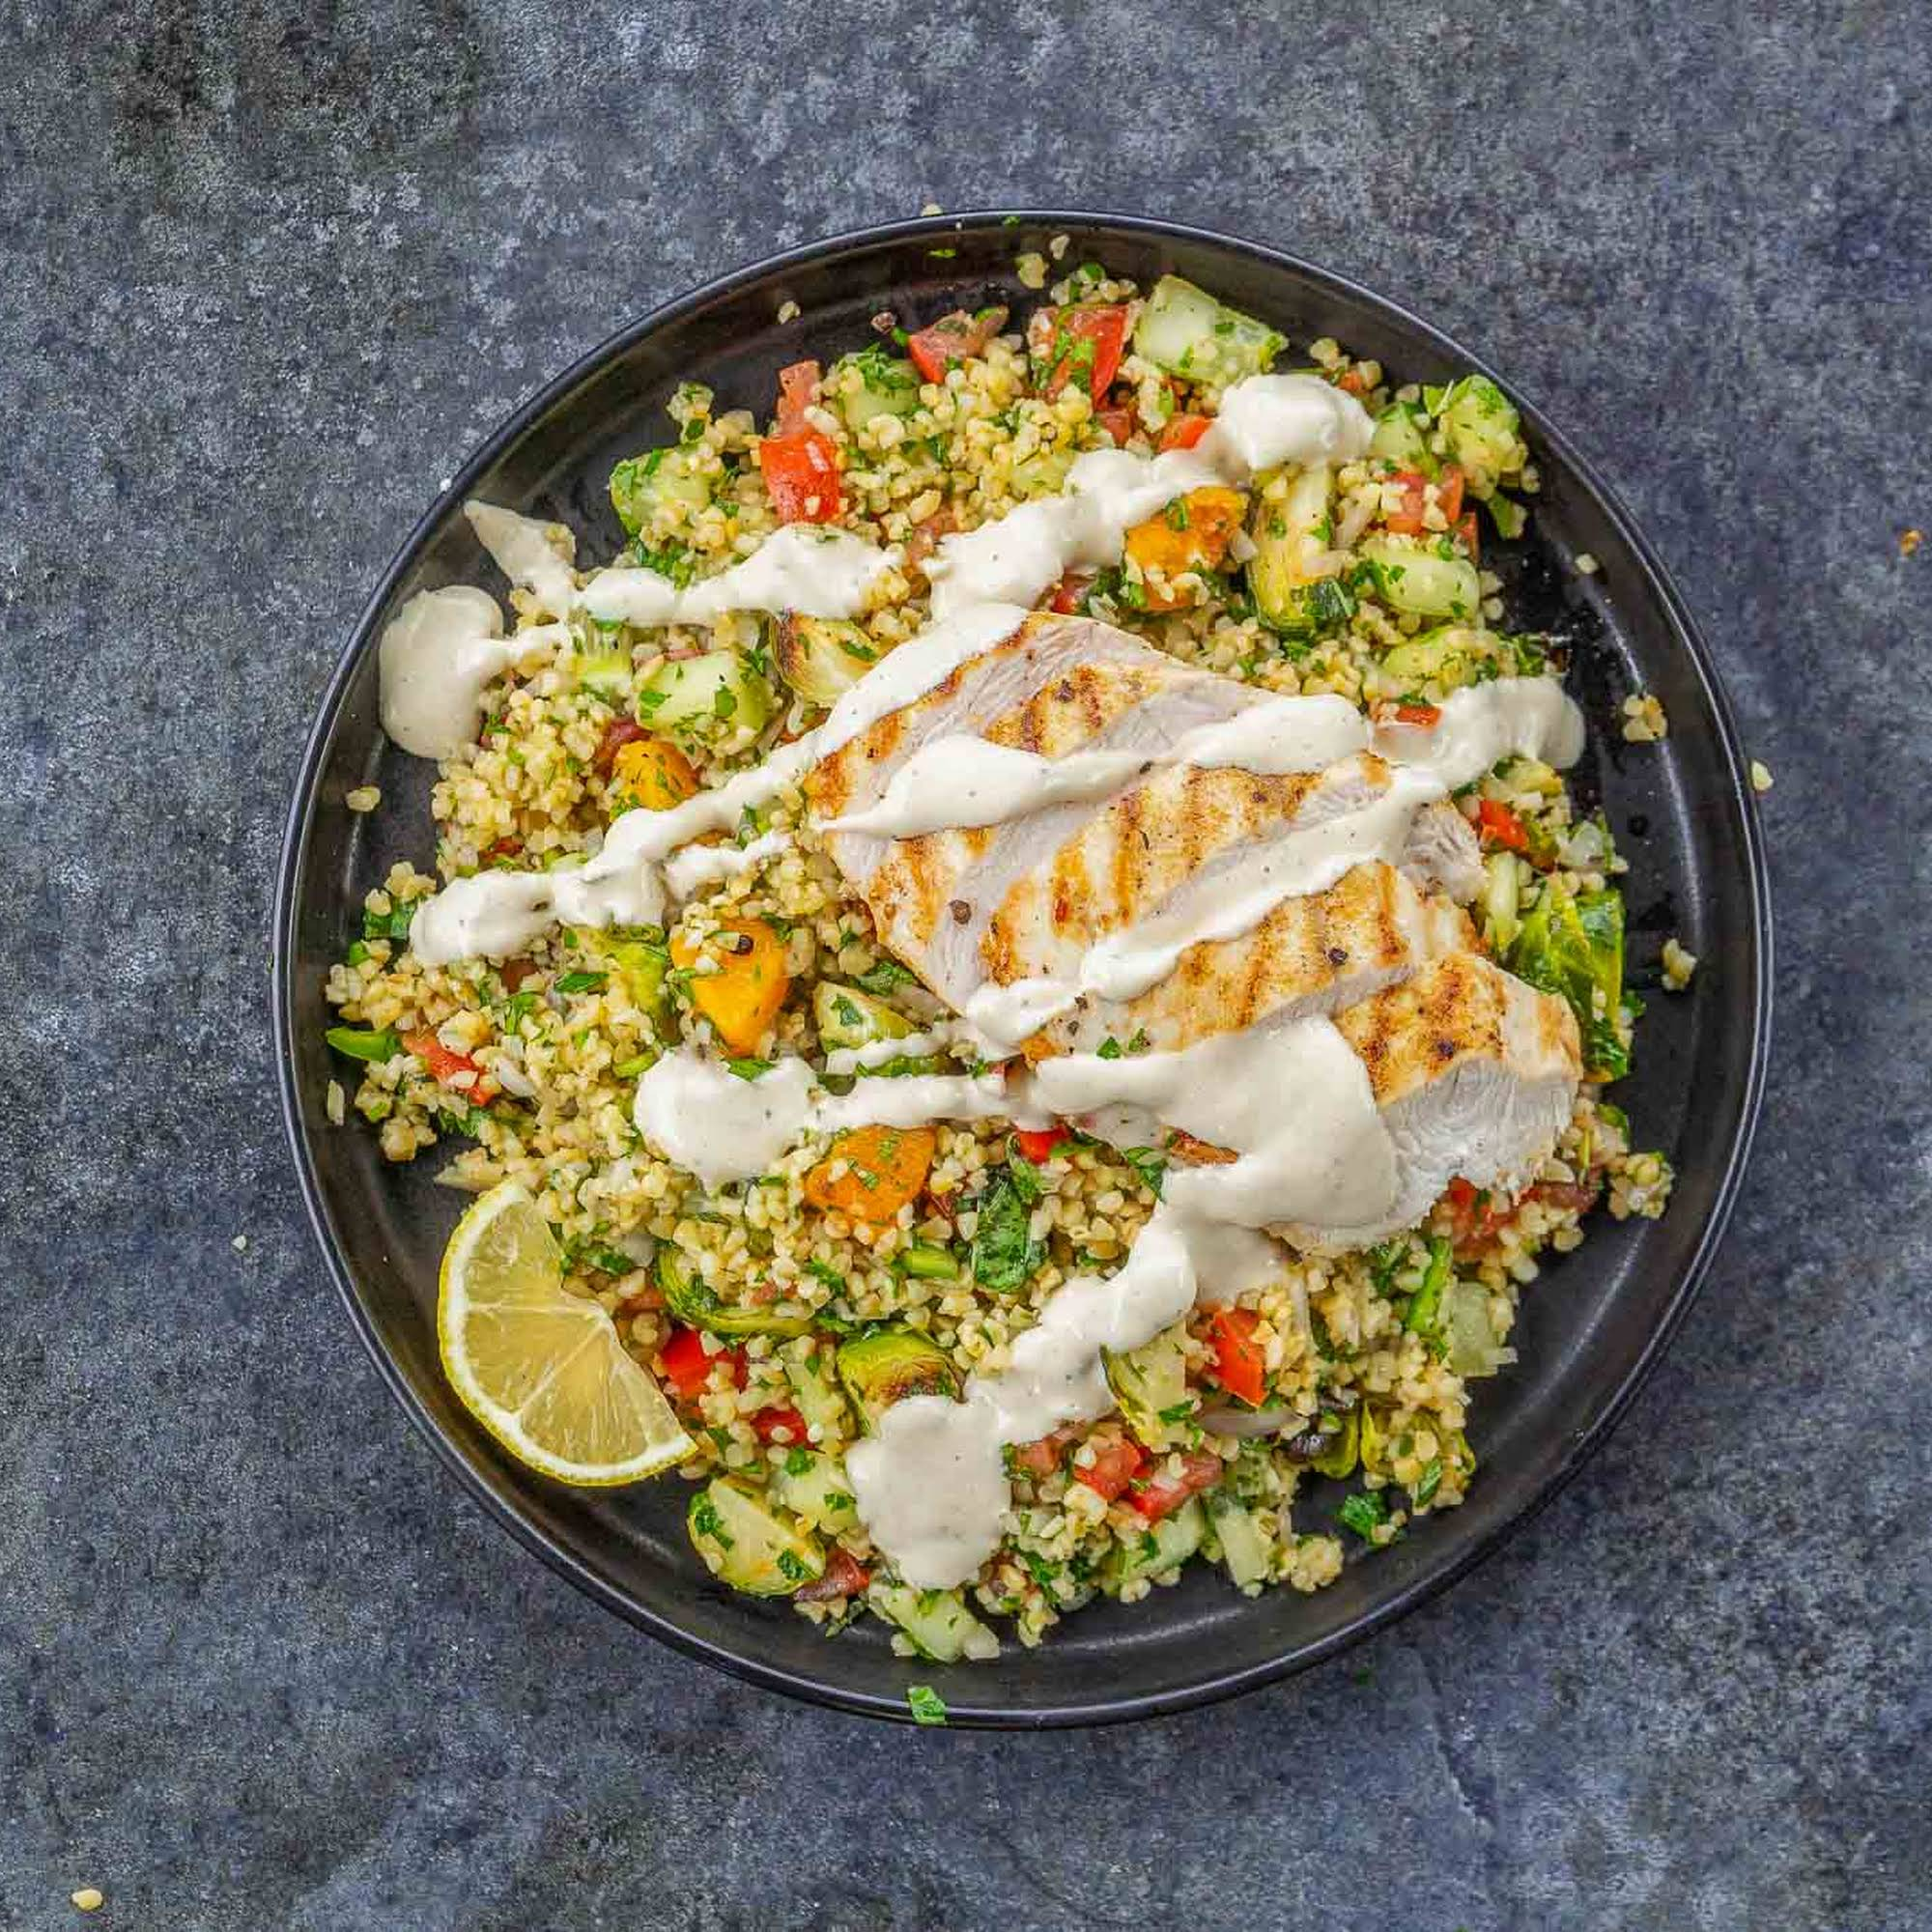 Chicken Tabbouleh Recipe  similar to Roasted Veggies and Tahini